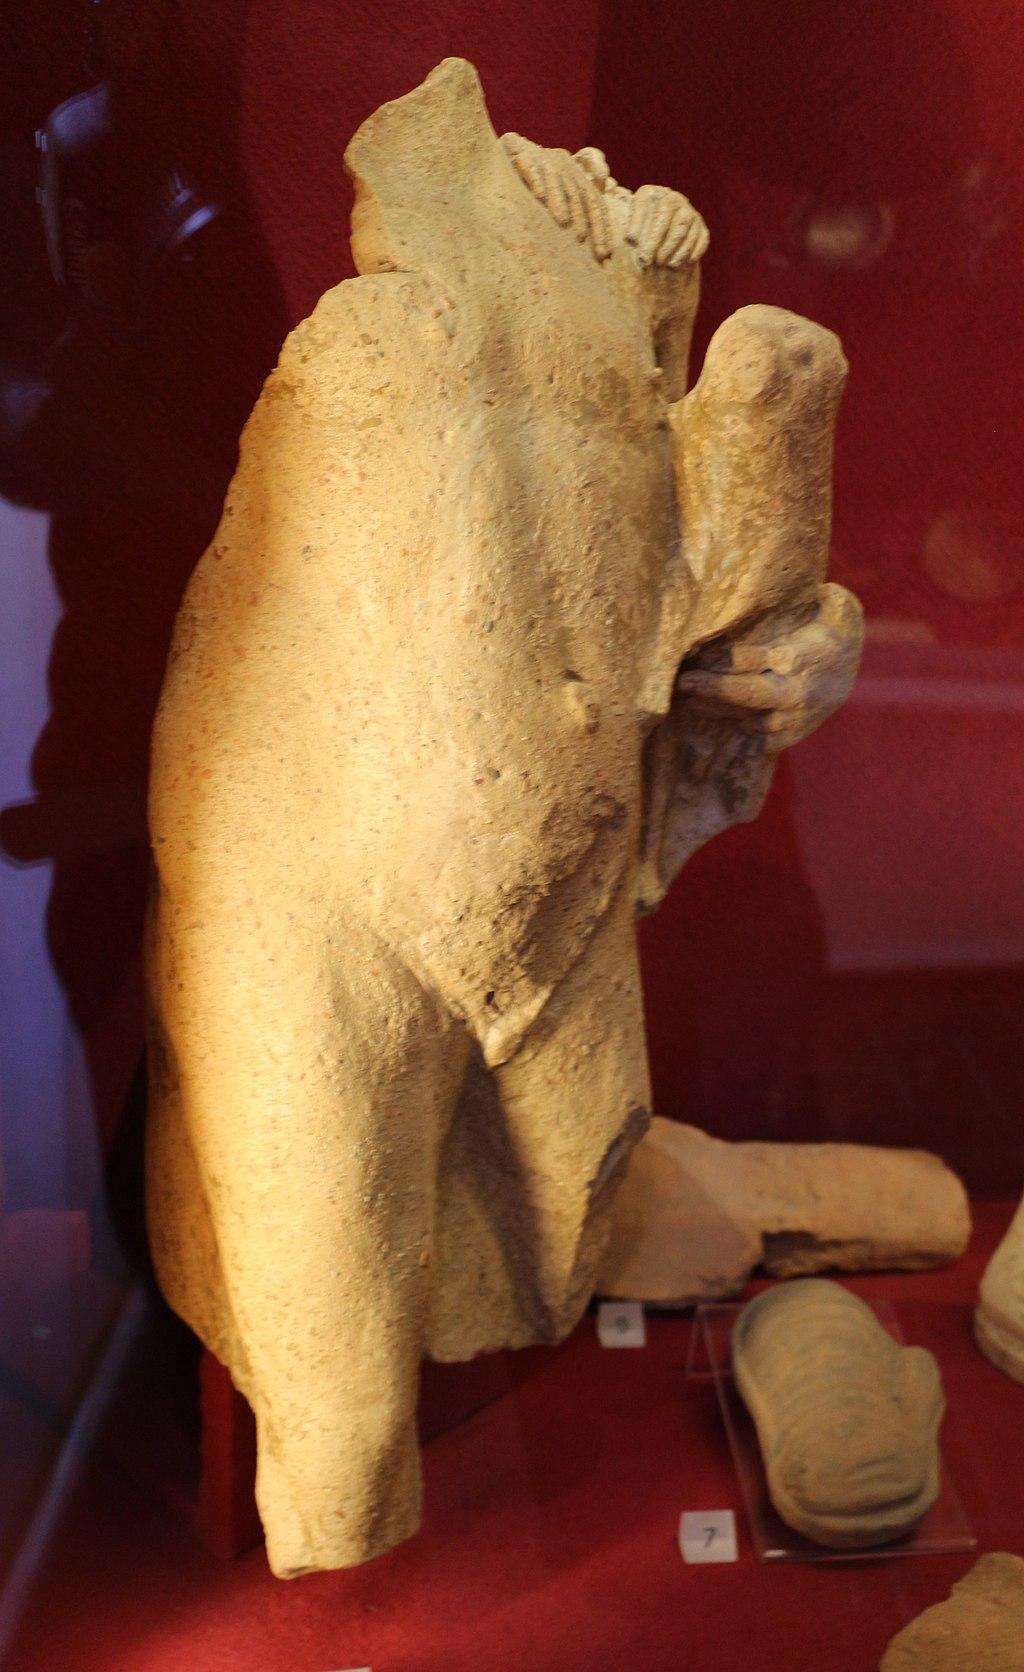 Fanciullo offerente un maialino, da san sisto a marsiliana d'albegna, III-II sec. ac